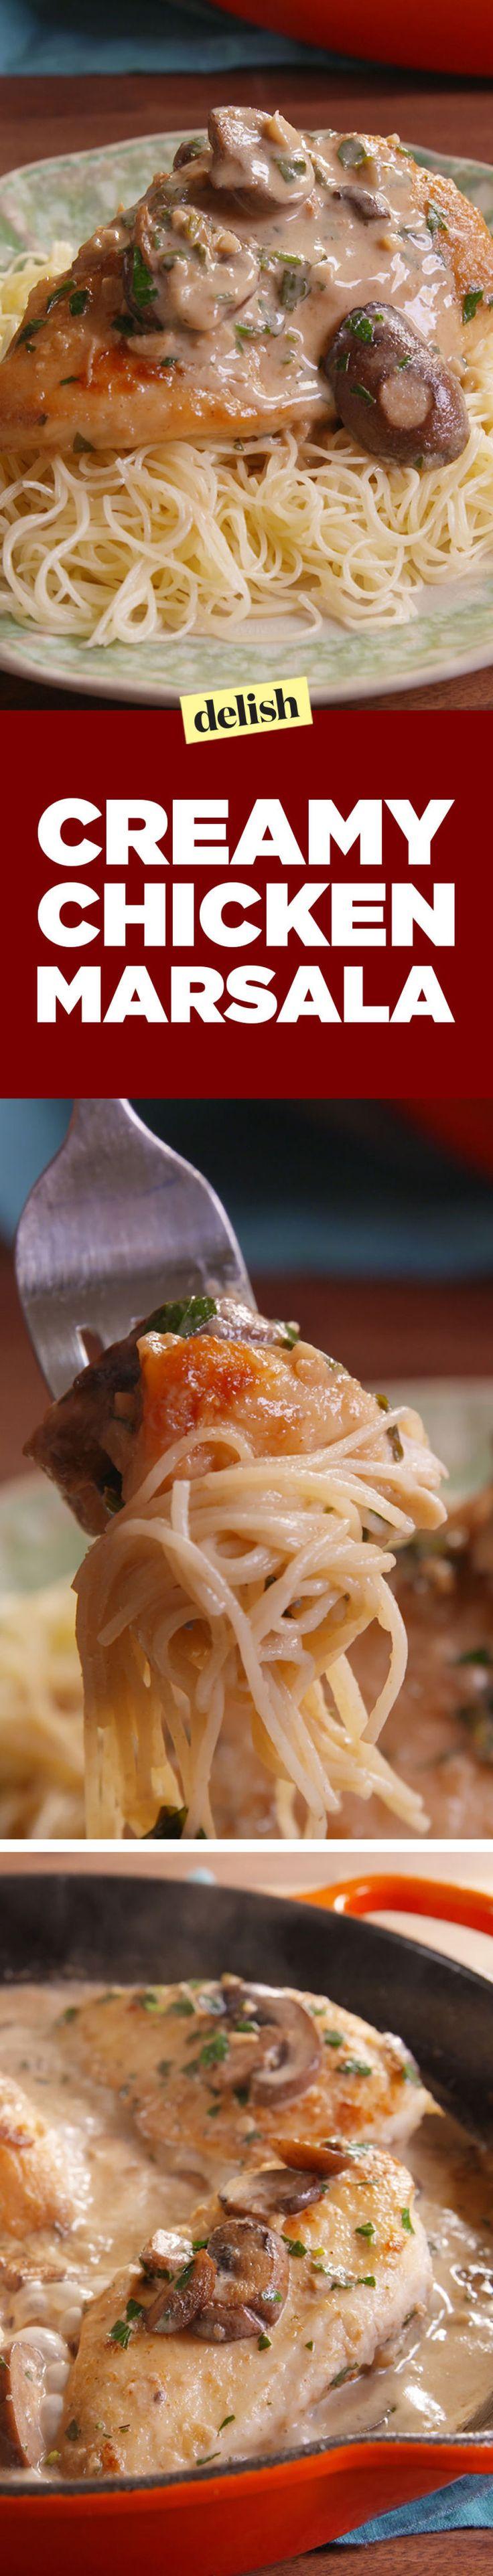 Creamy Chicken Marsala Is A Gift From Italian Gods Recipe Marsala Chicken Recipes Recipes Chicken Recipes